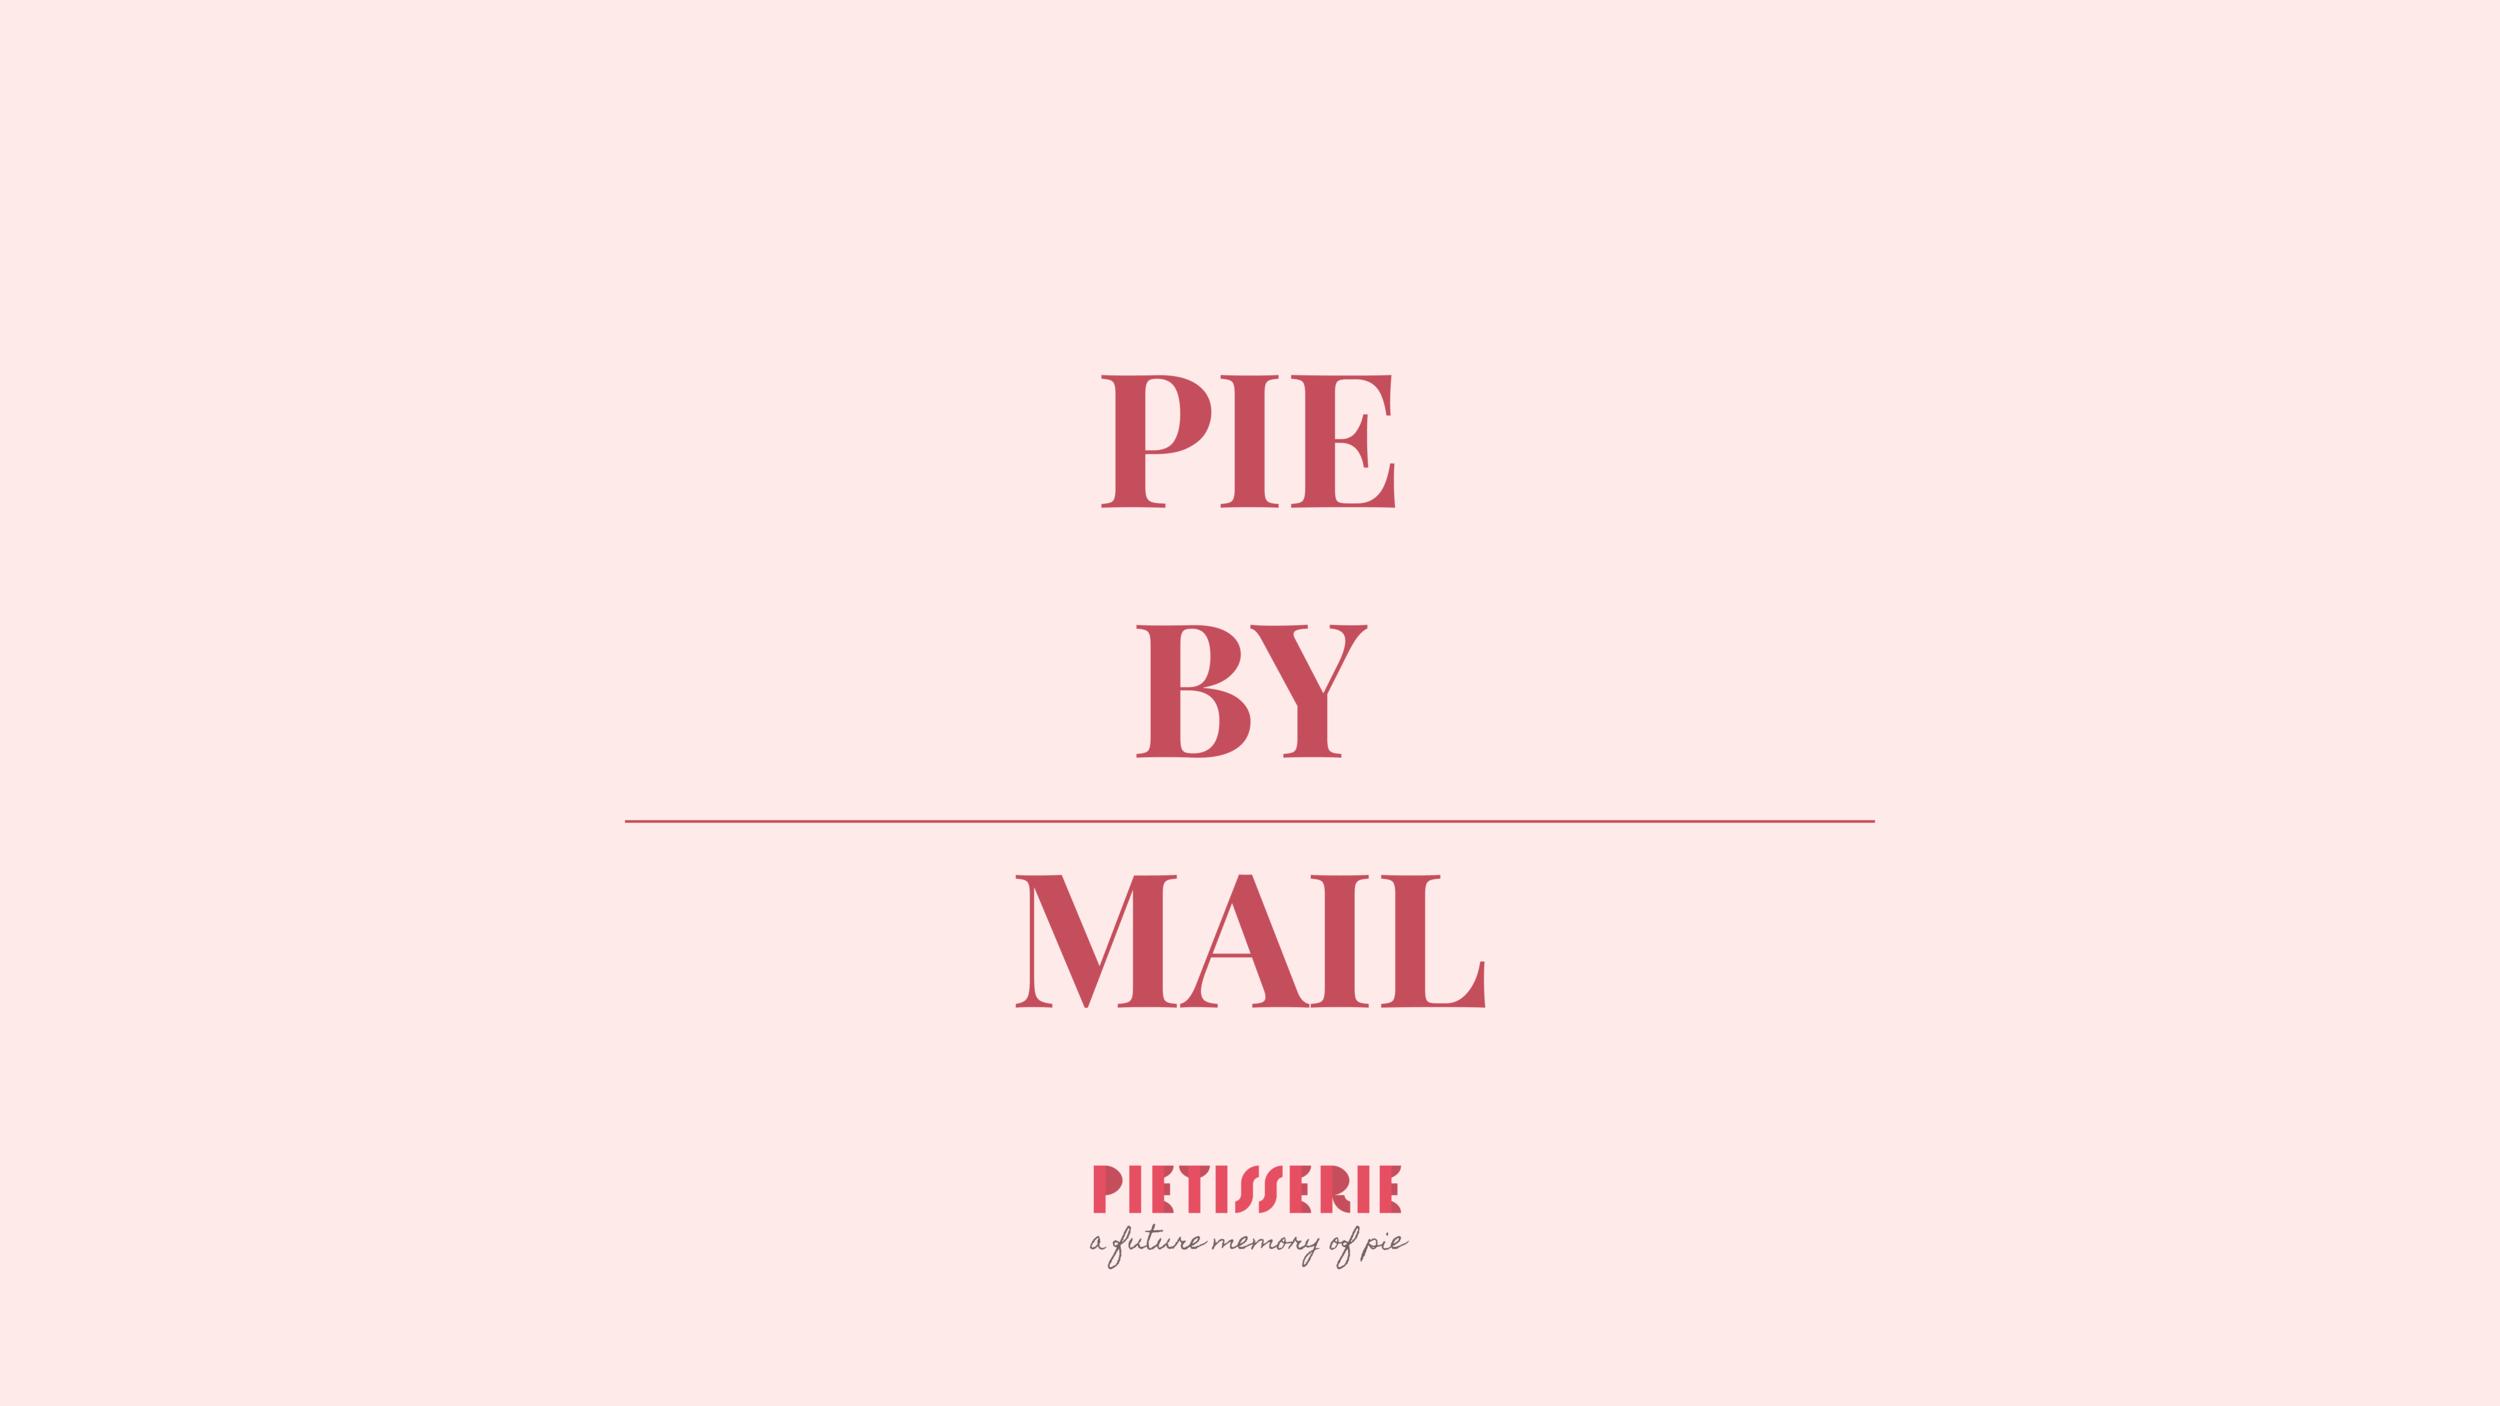 PieByMail@3x.png